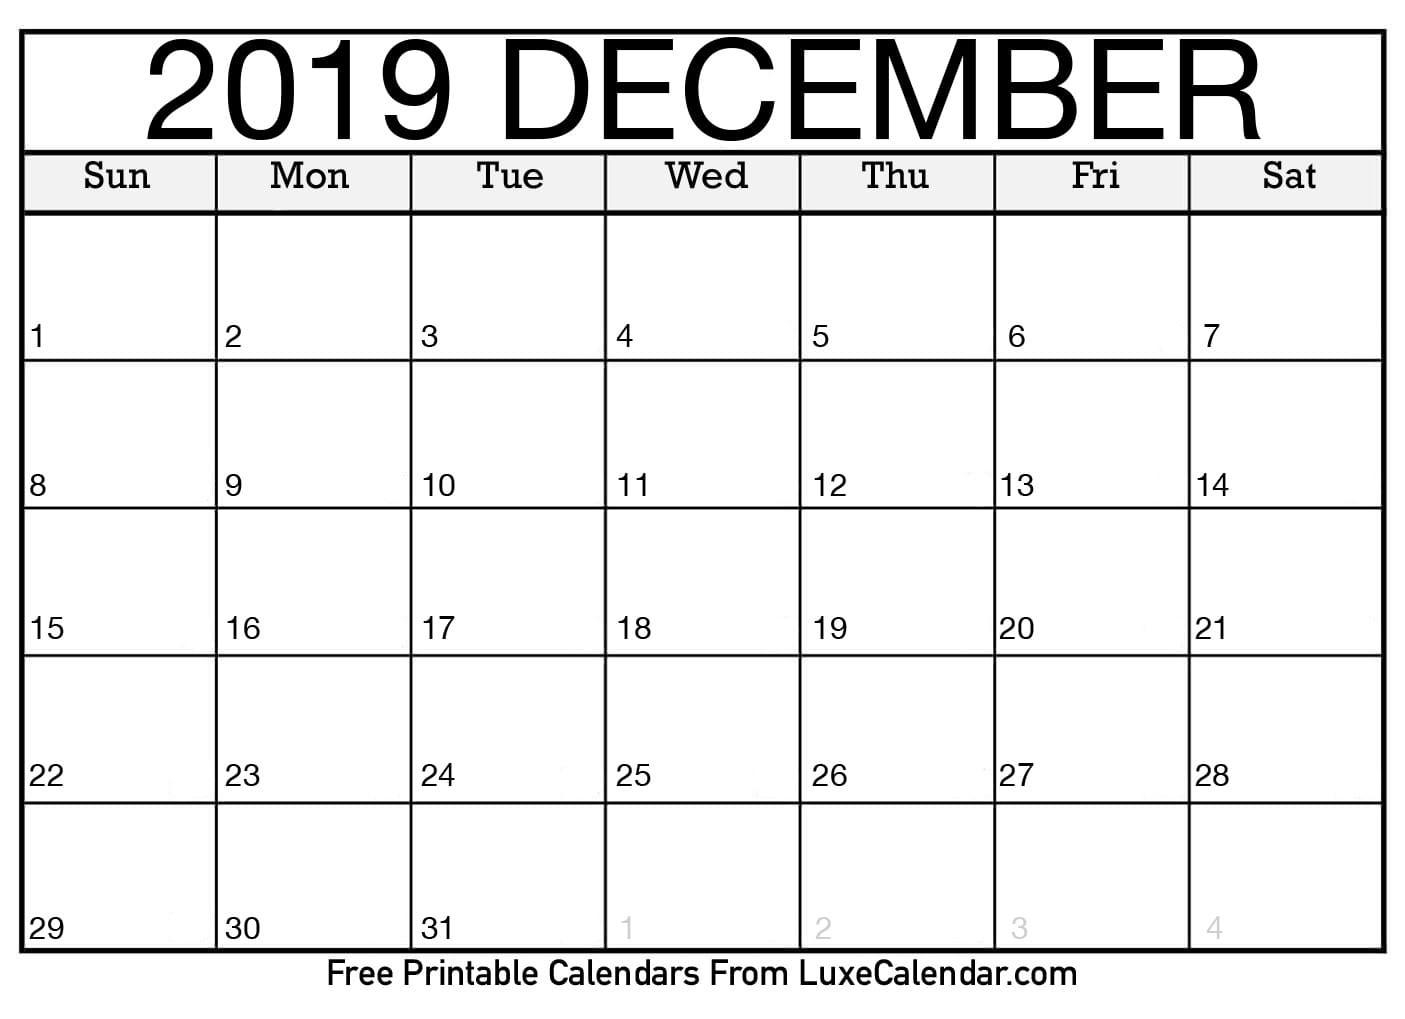 December Calendar 2019 Printable Blank December 2019 Printable Calendar Luxe Calendar